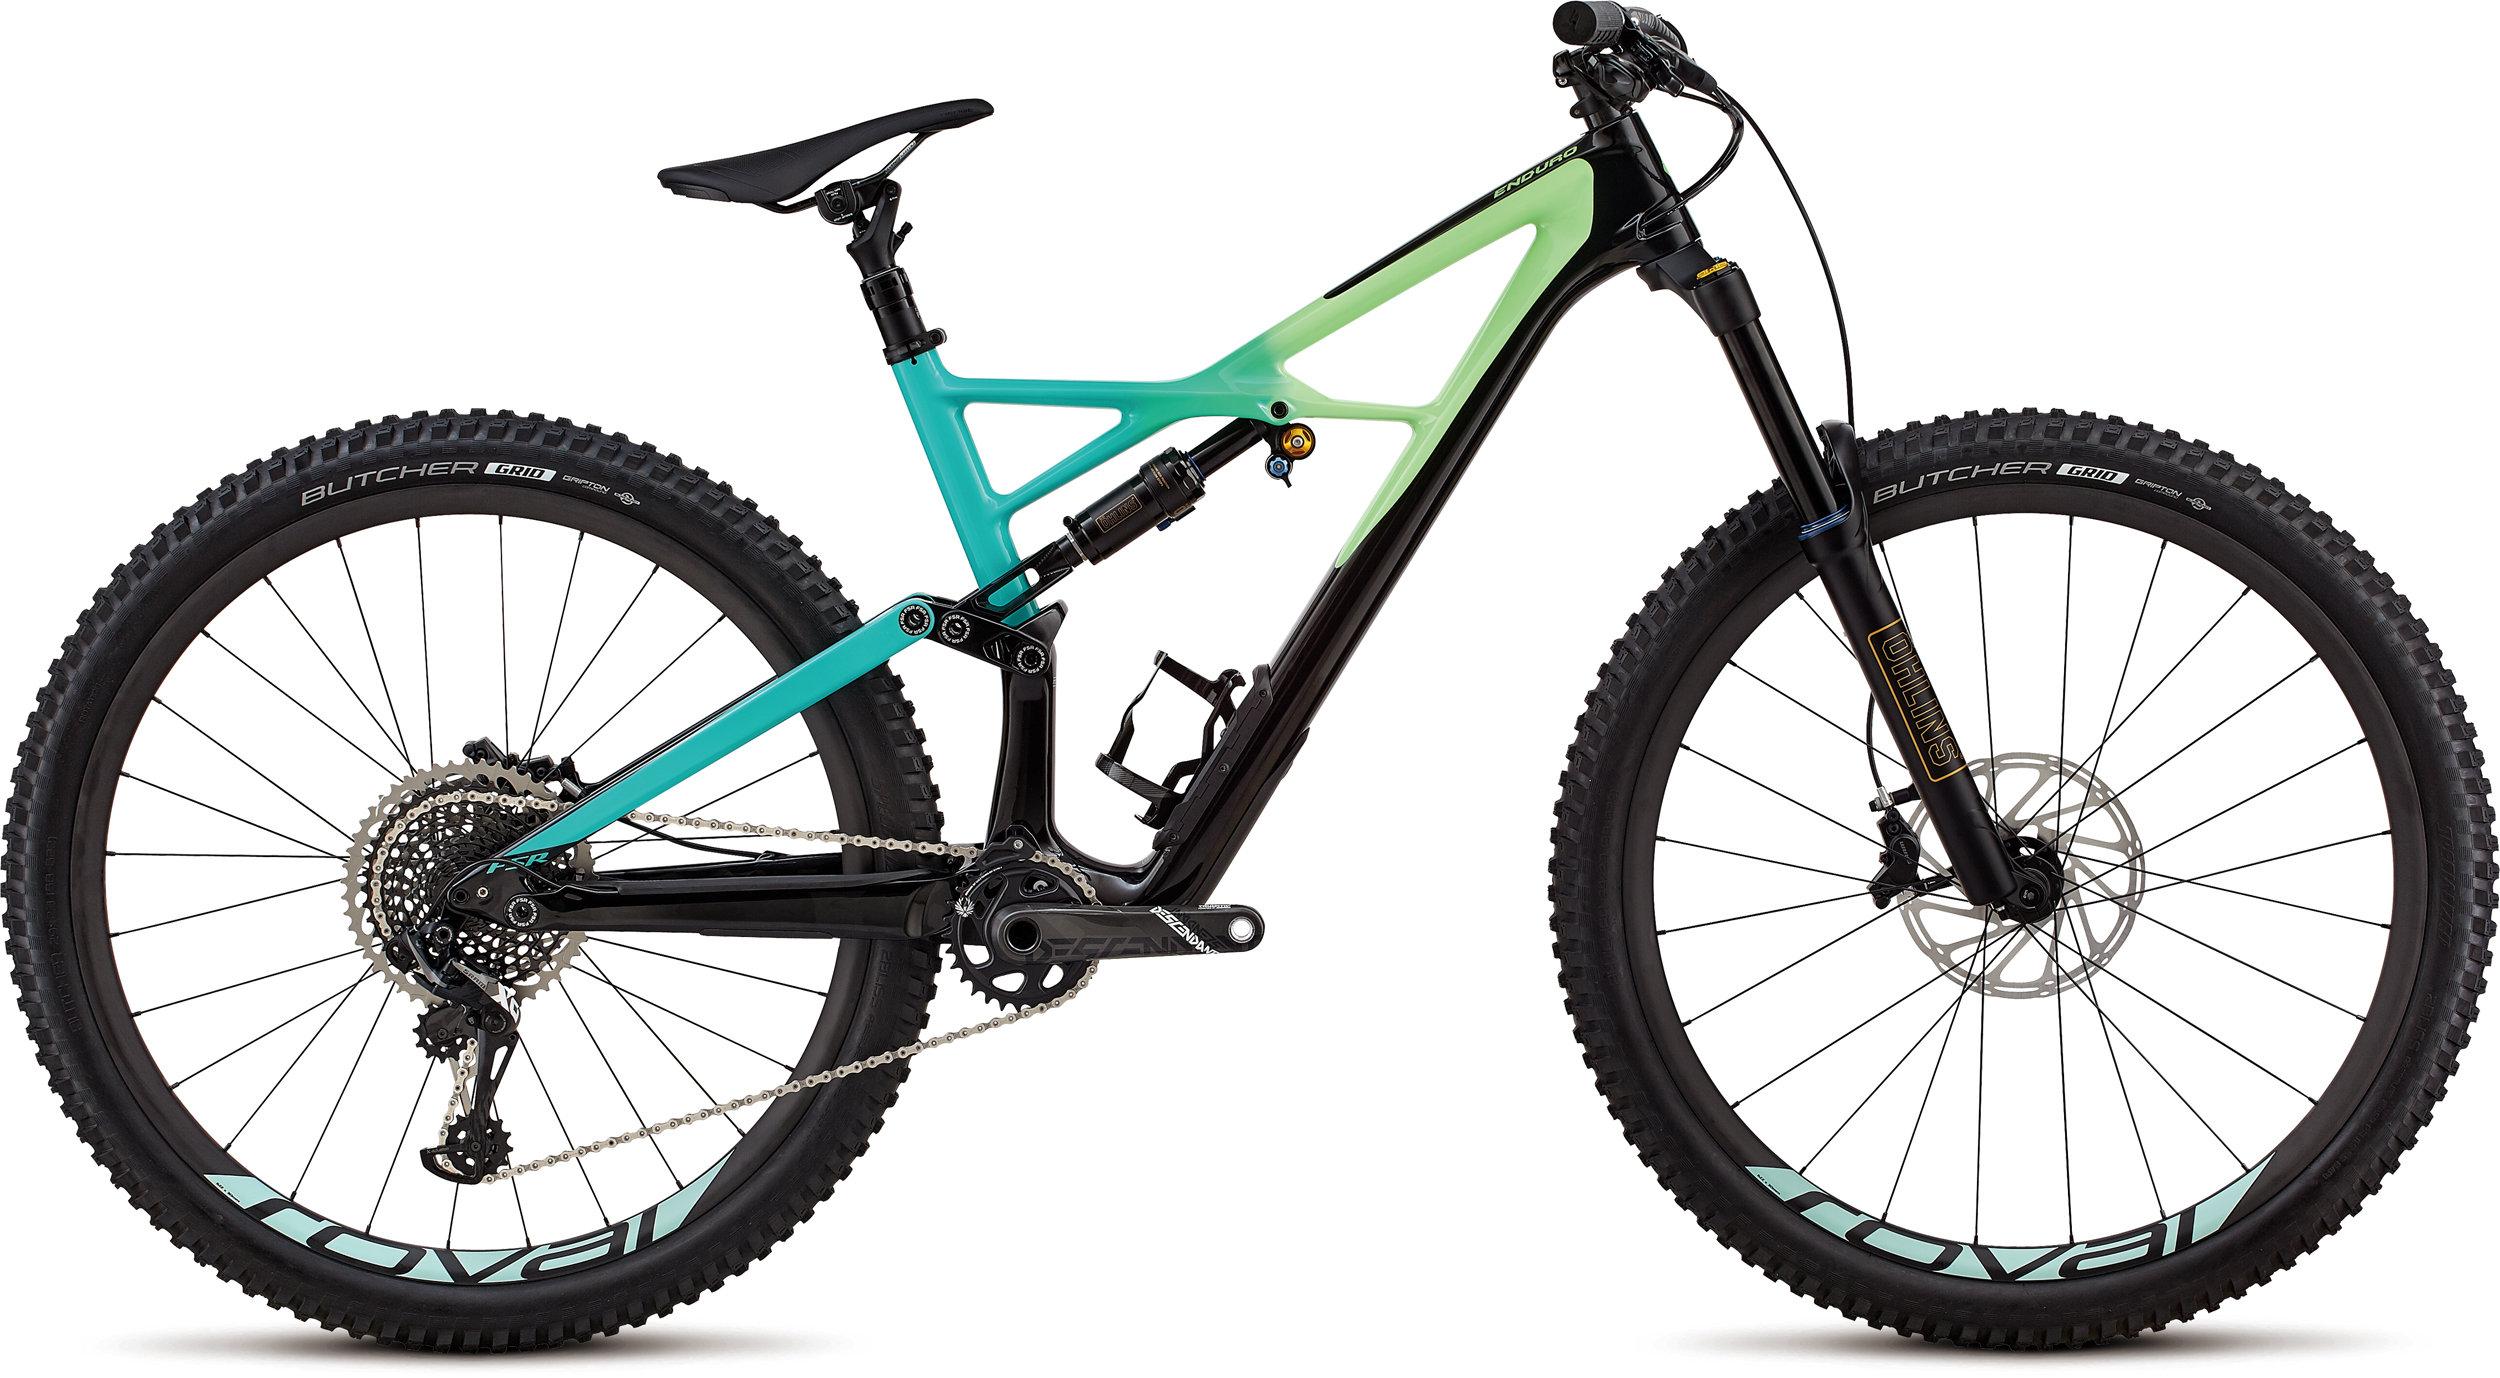 Specialized Enduro Pro 29/6Fattie GLOSS BLACK / CALI FADE / CHARCOAL S - Bike Maniac